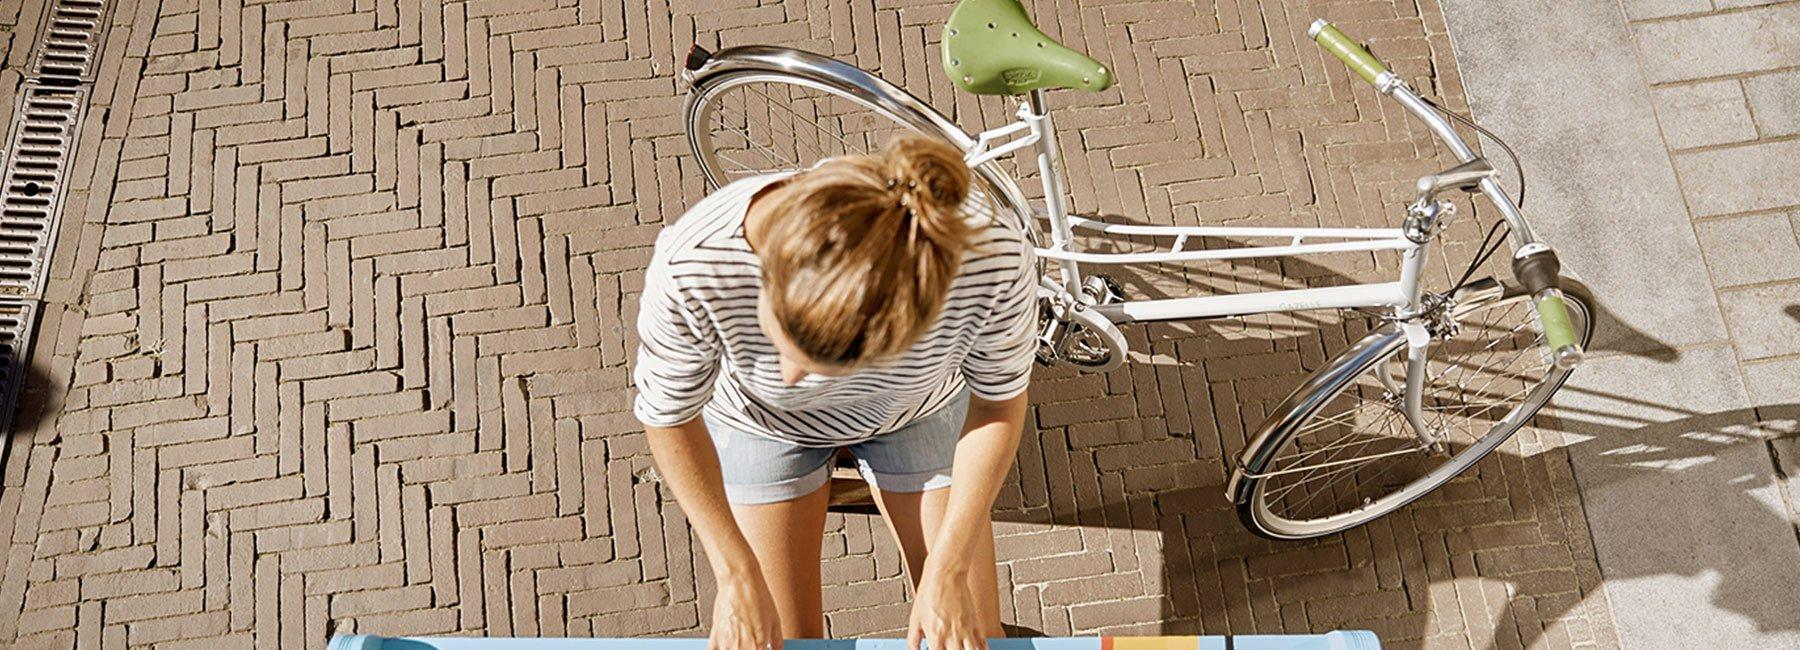 Gazelle van Stael Retro-Fahrräder